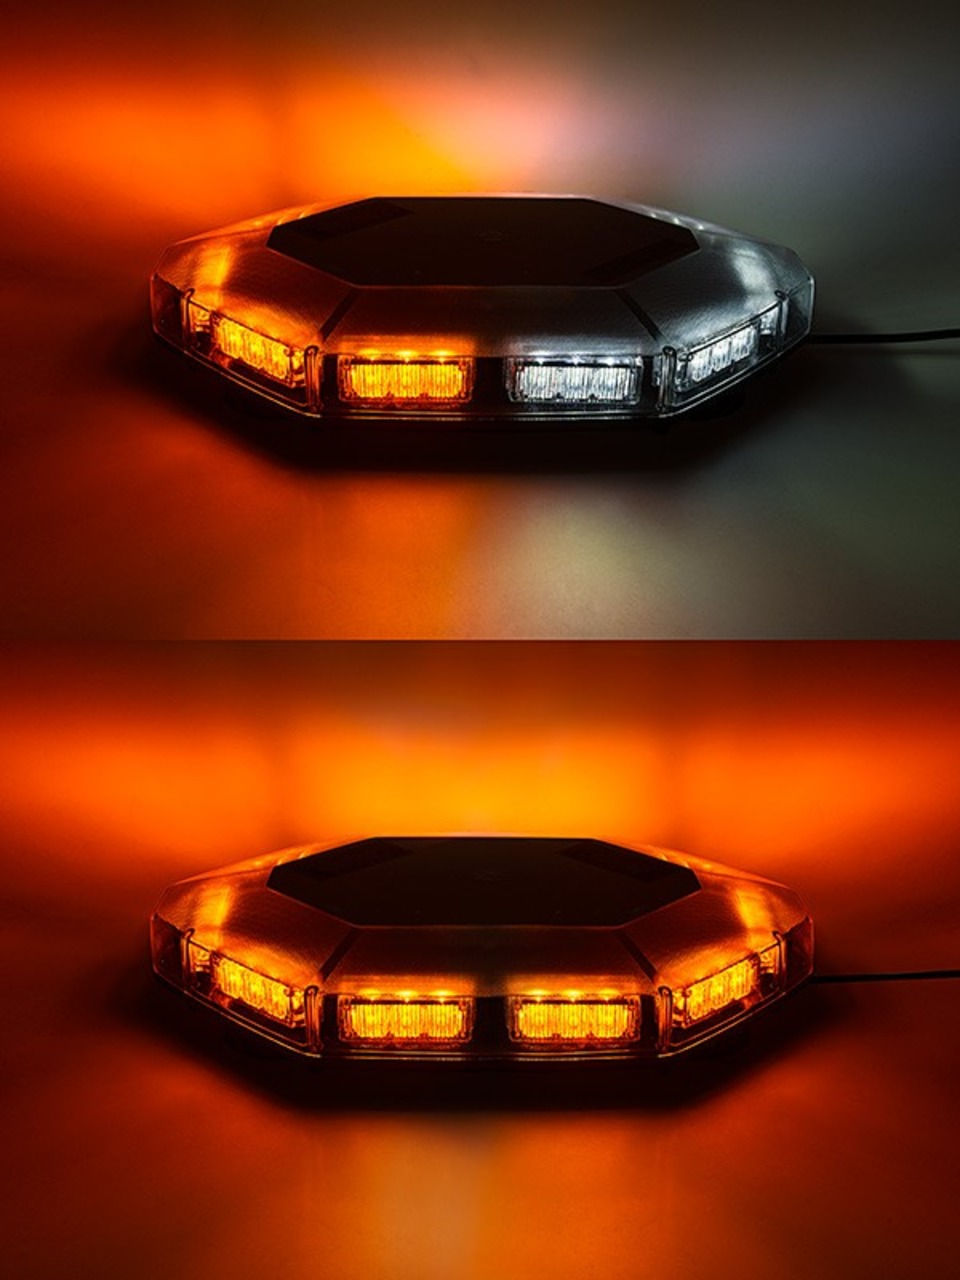 Super bright leds inc super bright led offers new mini light bar in super led lights 573259e124382 aloadofball Image collections